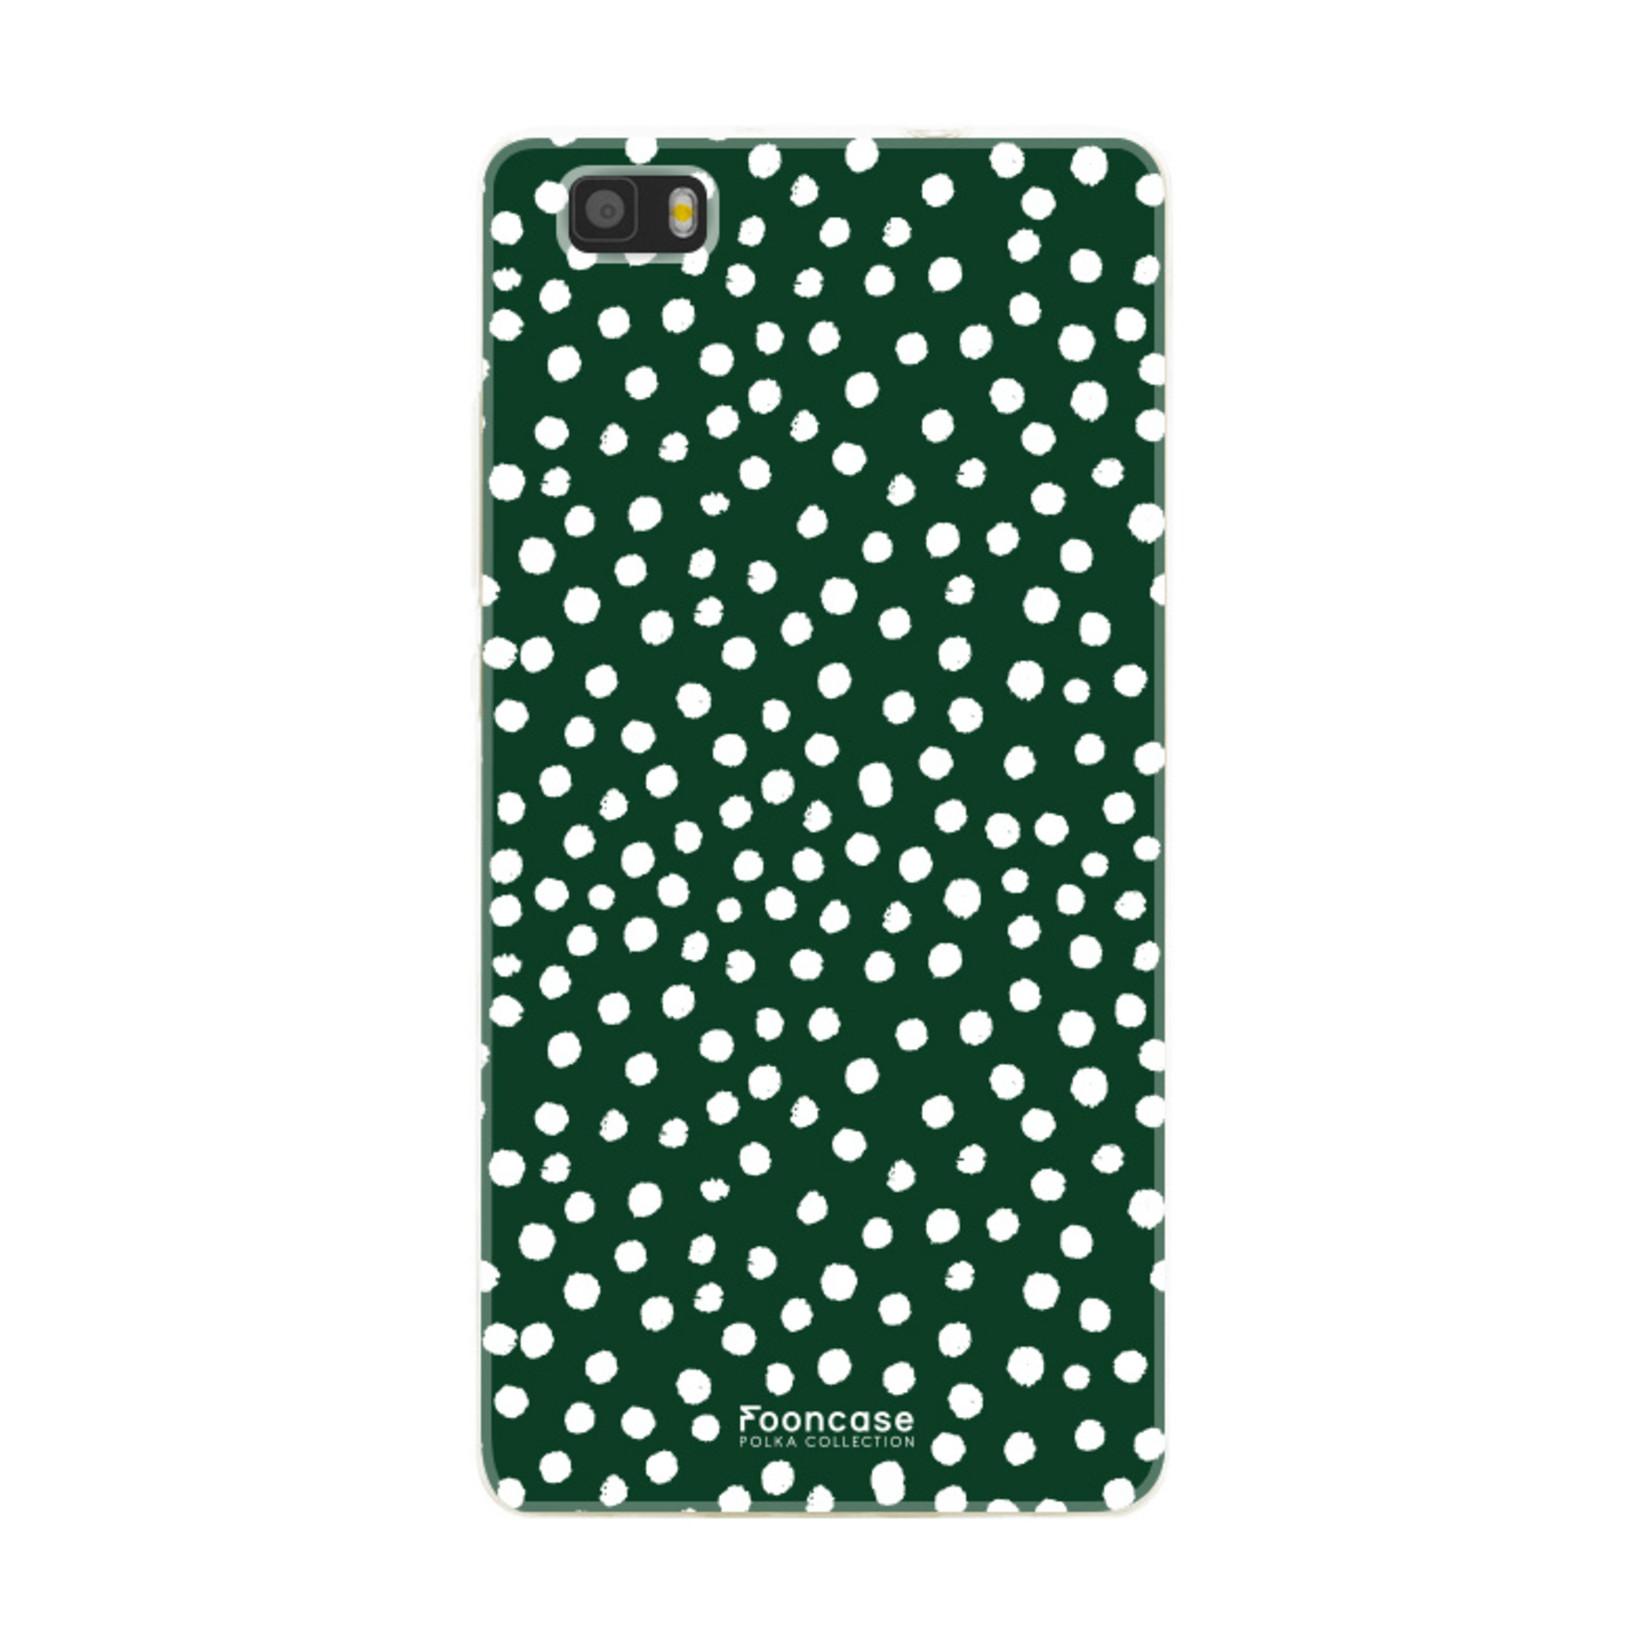 FOONCASE Huawei P8 Lite 2016 hoesje TPU Soft Case - Back Cover - POLKA COLLECTION / Stipjes / Stippen / Groen